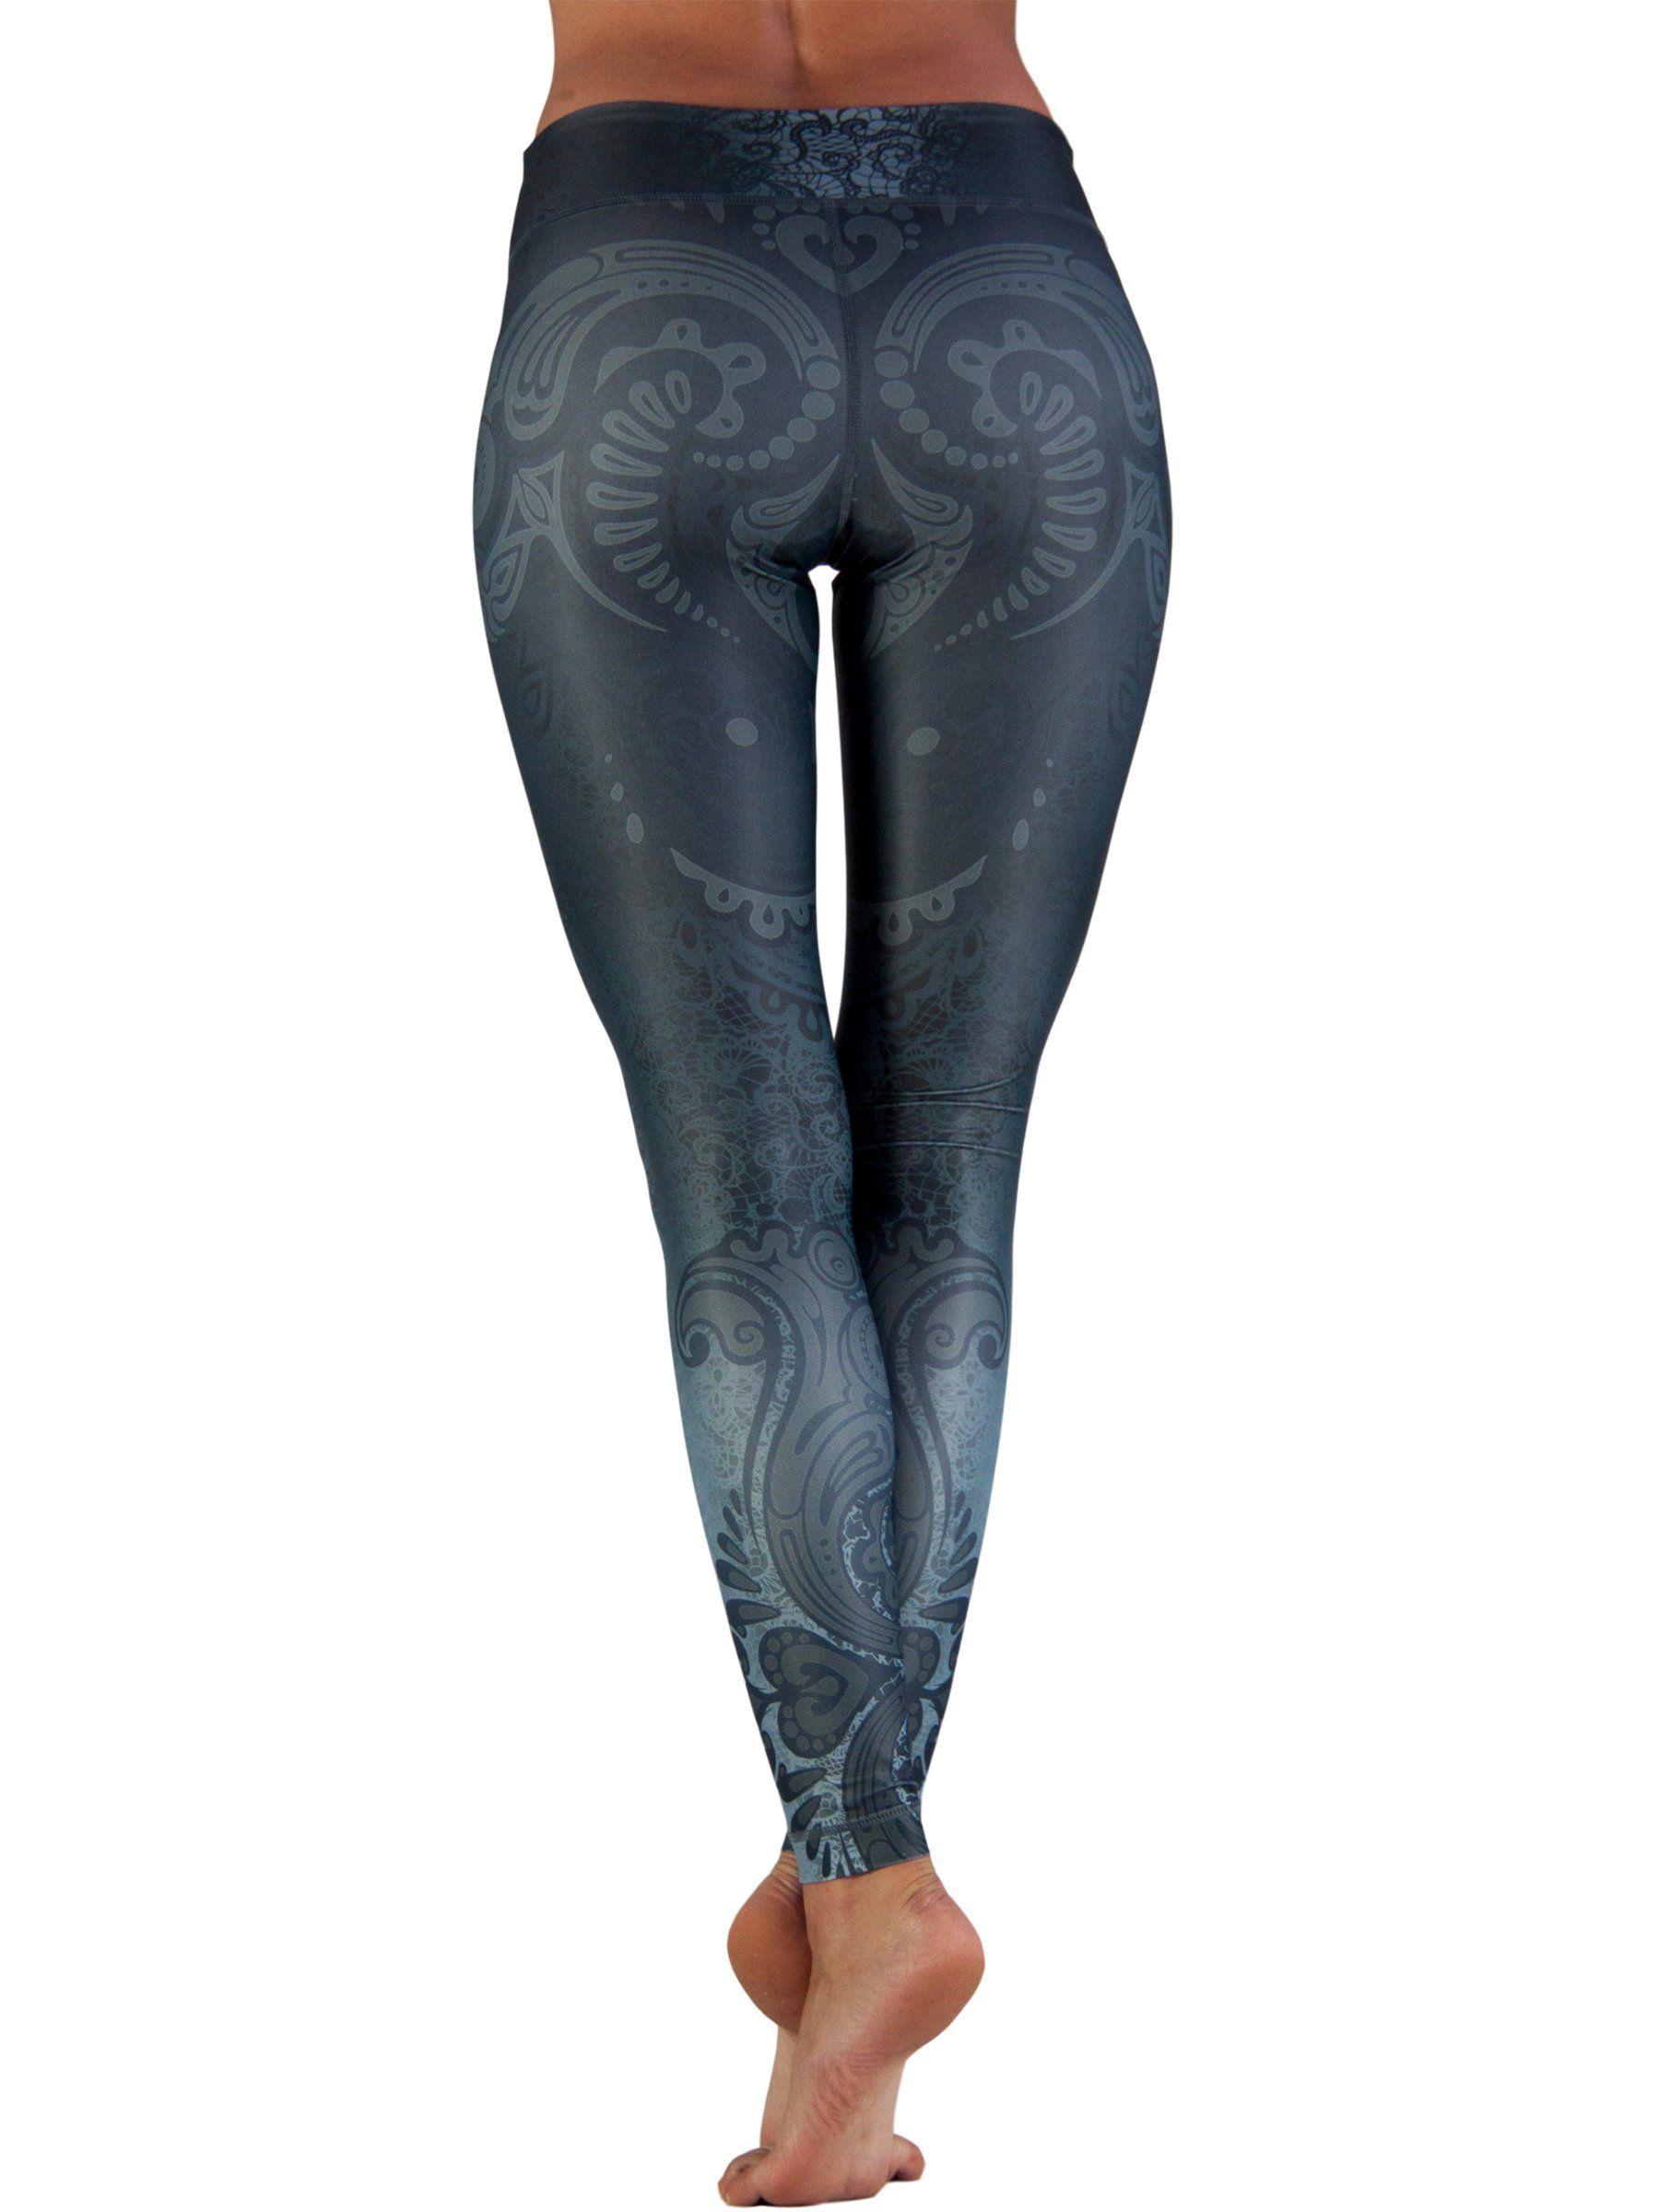 f1d55e16a73307 Maori Magic Advanced Yoga, Yoga Session, Maori, Pants For Women, Yoga Pants